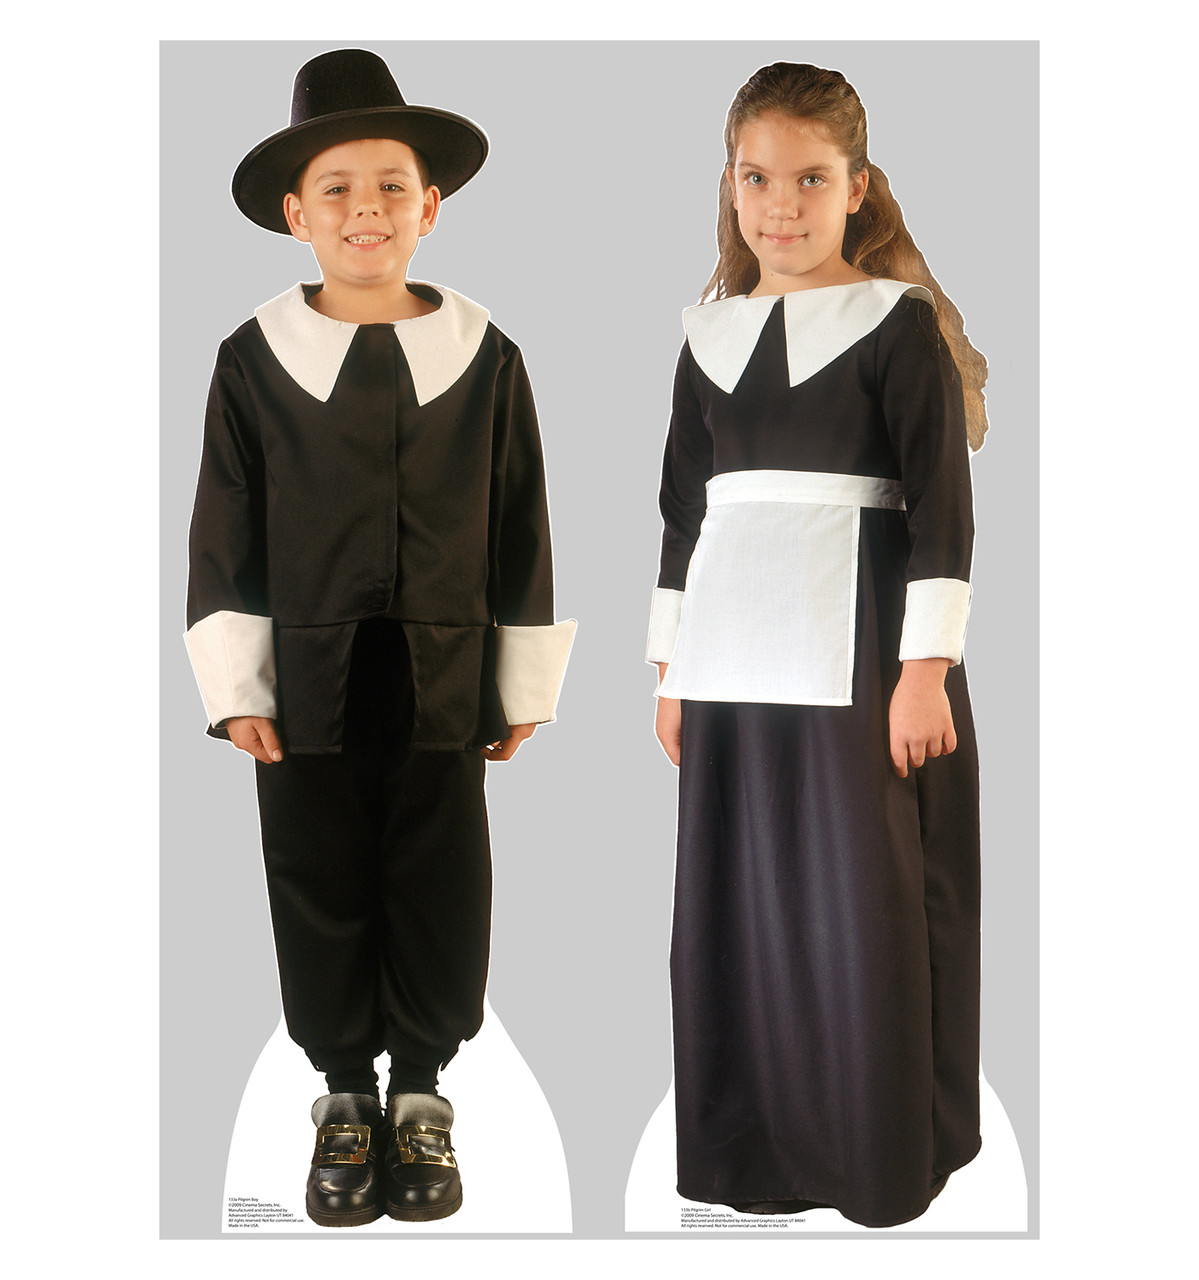 Life Size Pilgrim Boy And Girl Cardboard Standup Cardboard Cutout